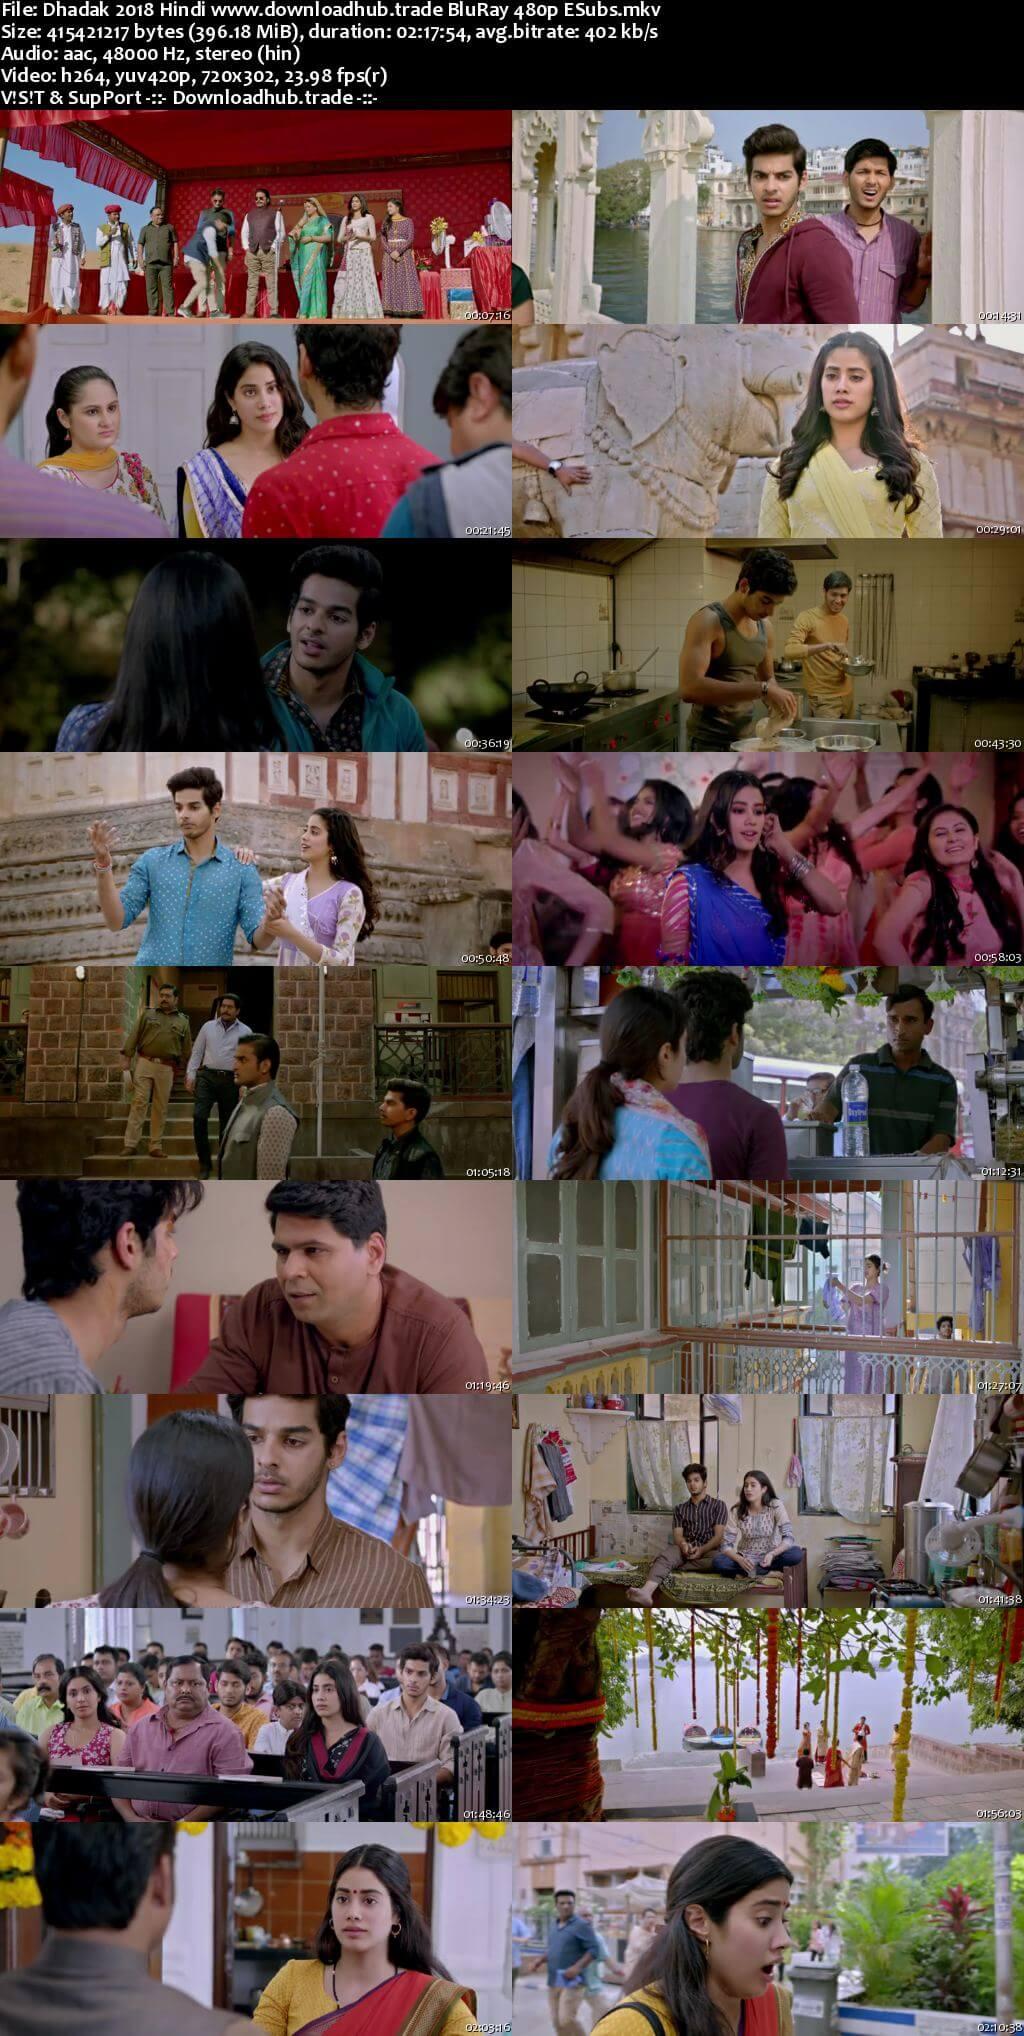 Dhadak 2018 Hindi 400MB BluRay 480p ESubs